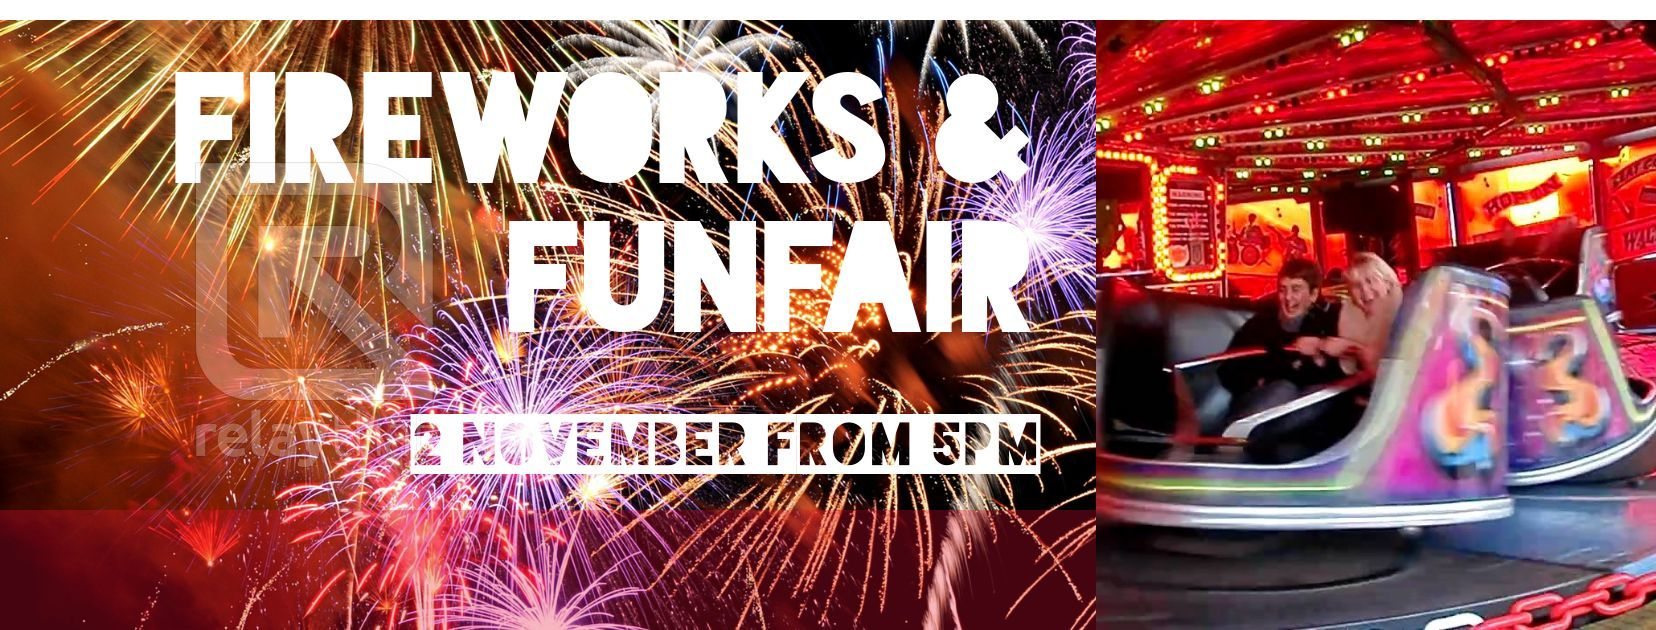 Fireworks and funfair - 2 November 2018